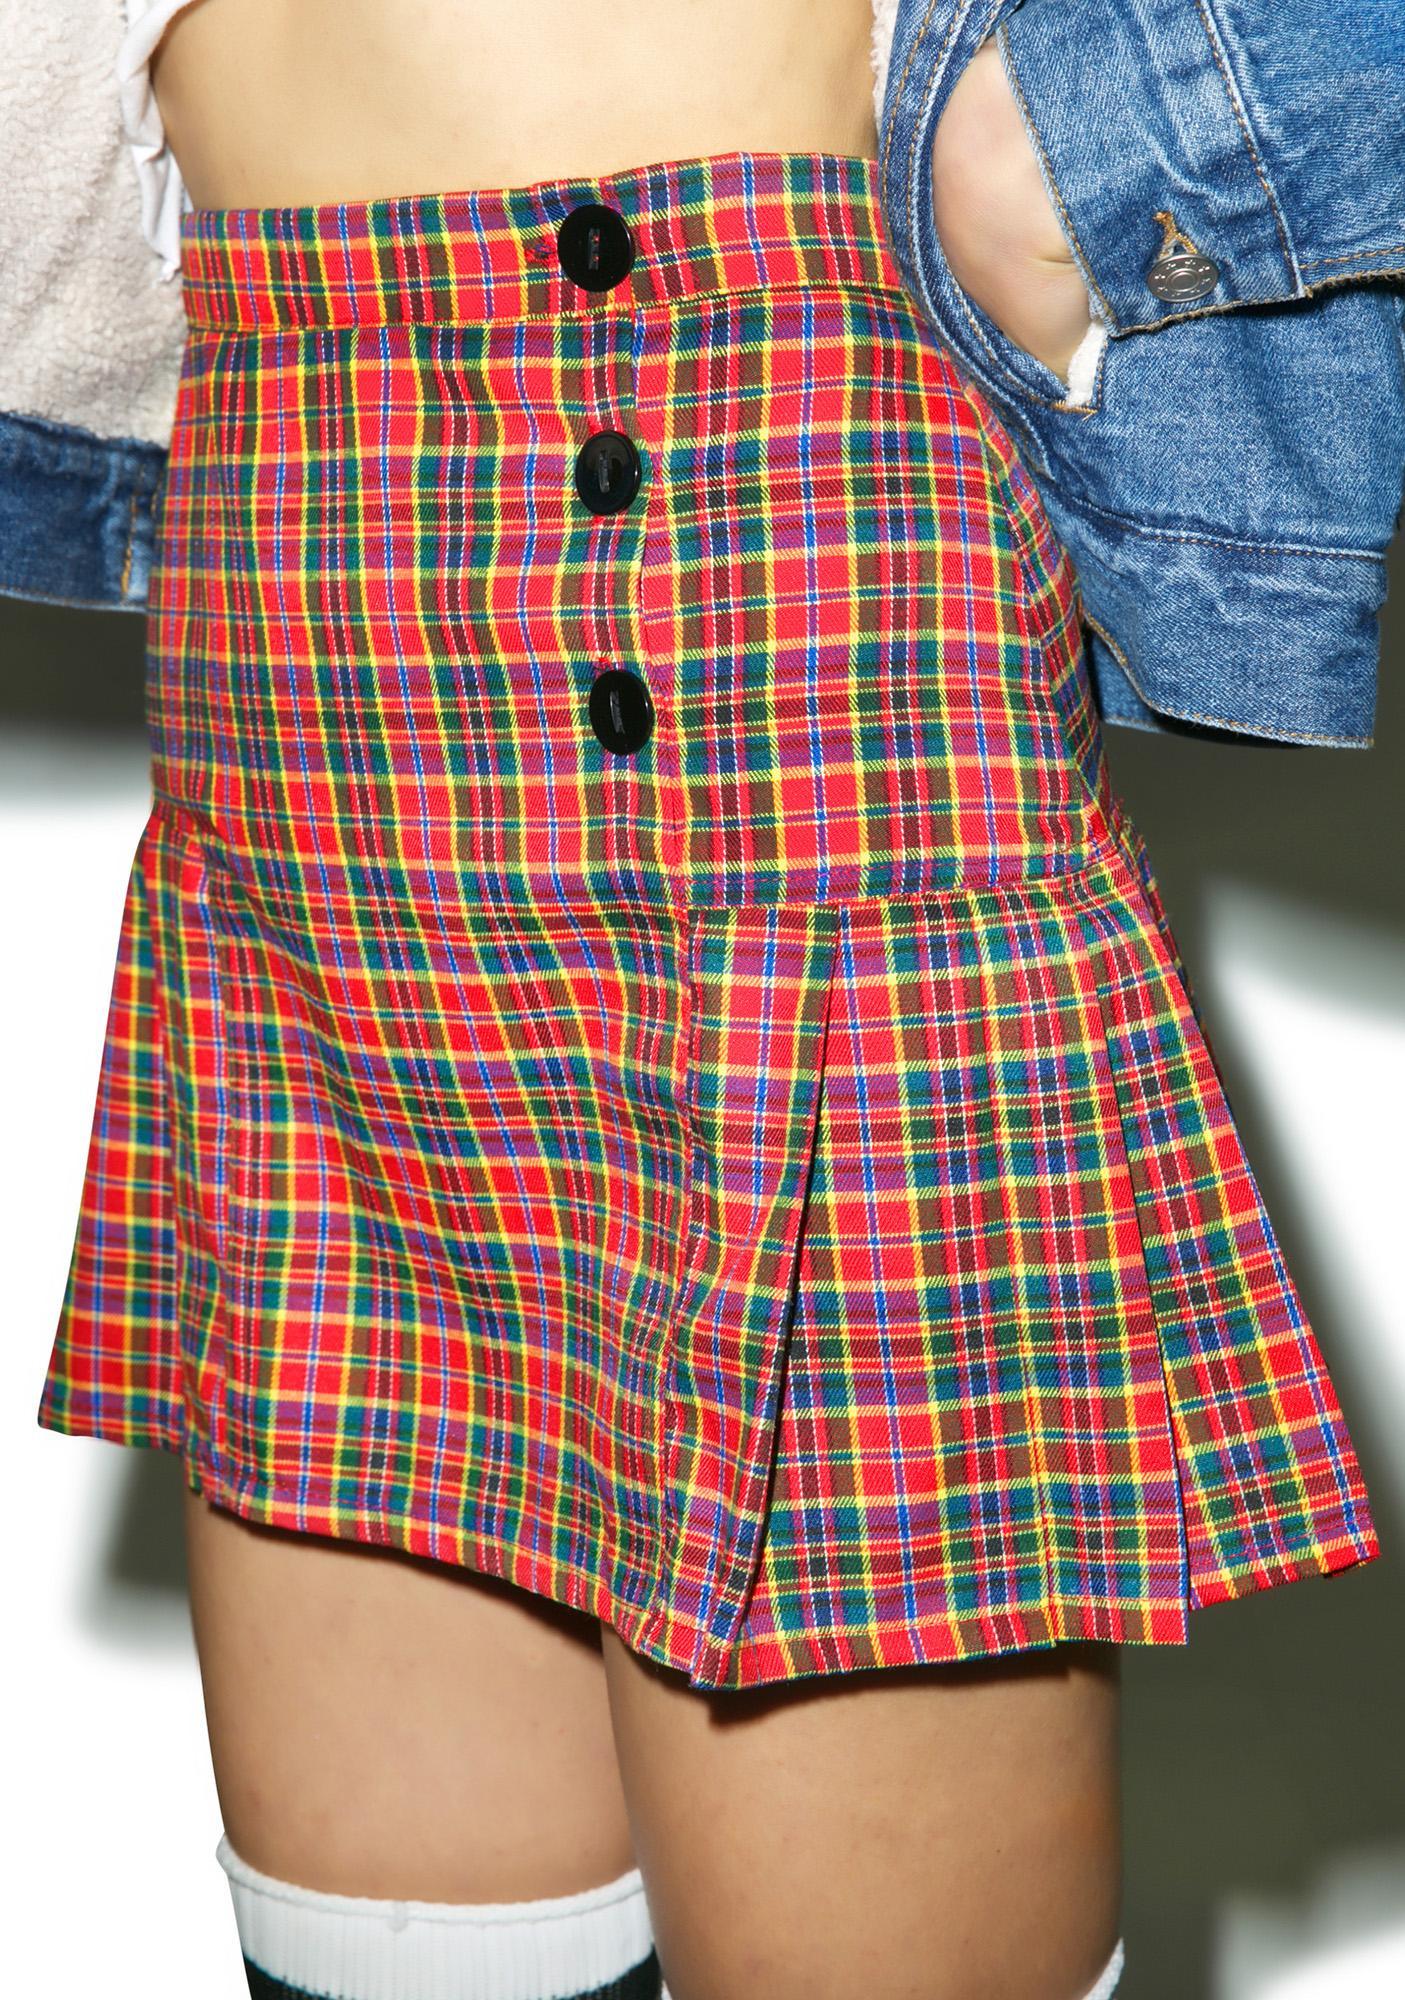 O Mighty The Naughty Plaid Skirt